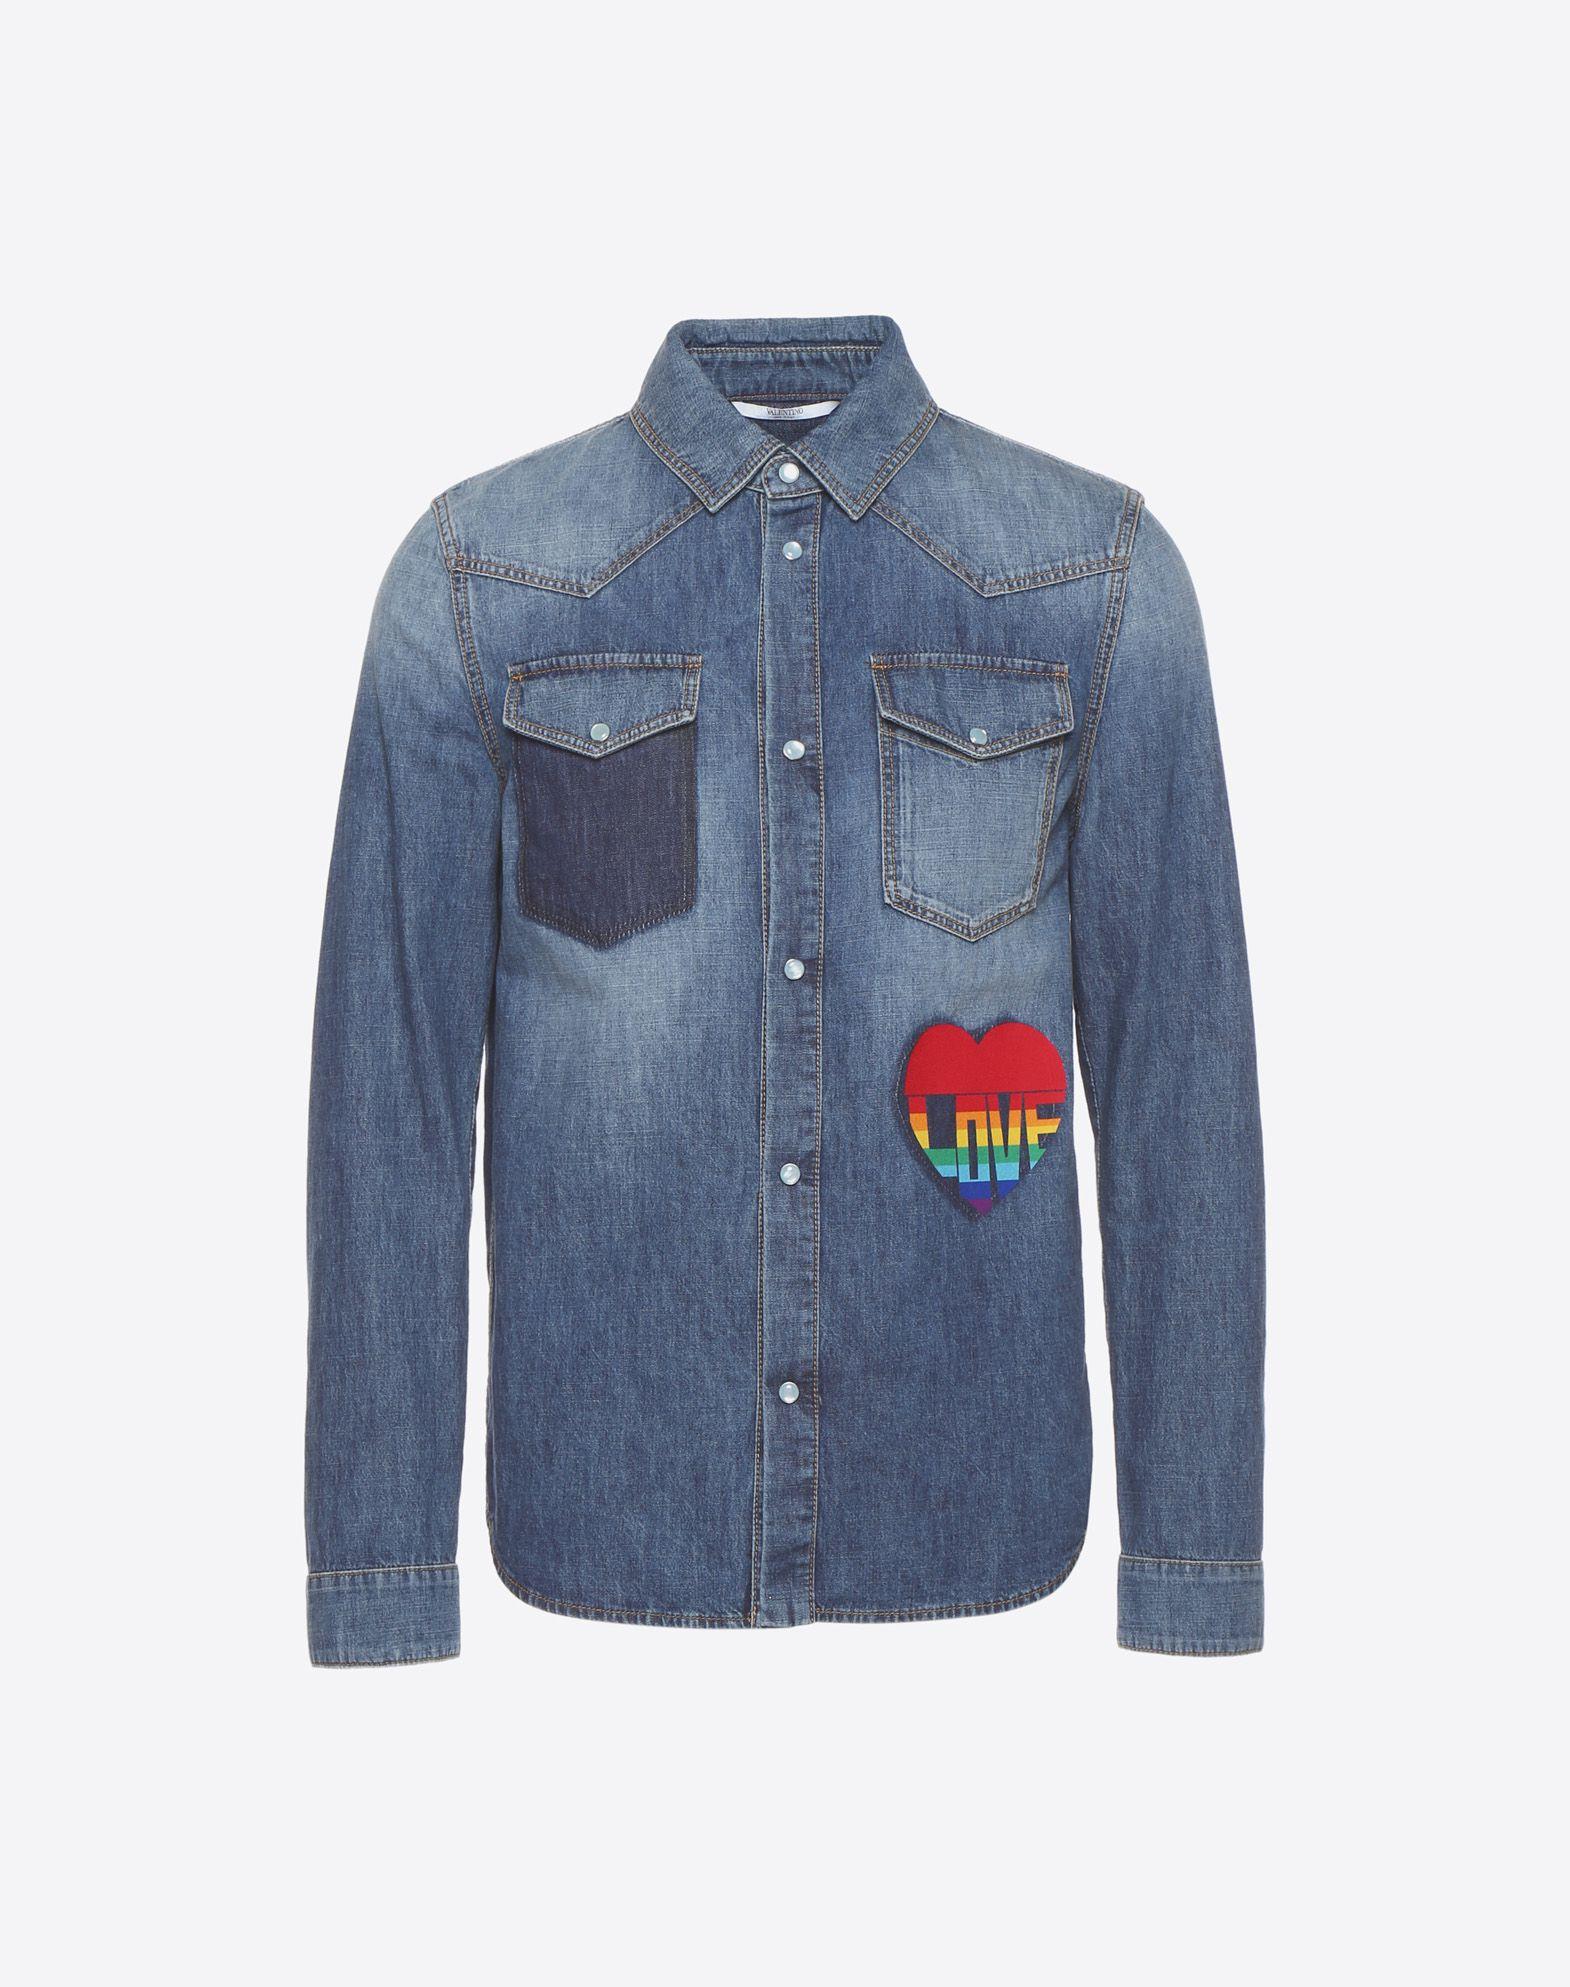 VALENTINO Denim Classic Neckline Snap button closure Dual chest pockets Long sleeves Print Faded  12176907vb